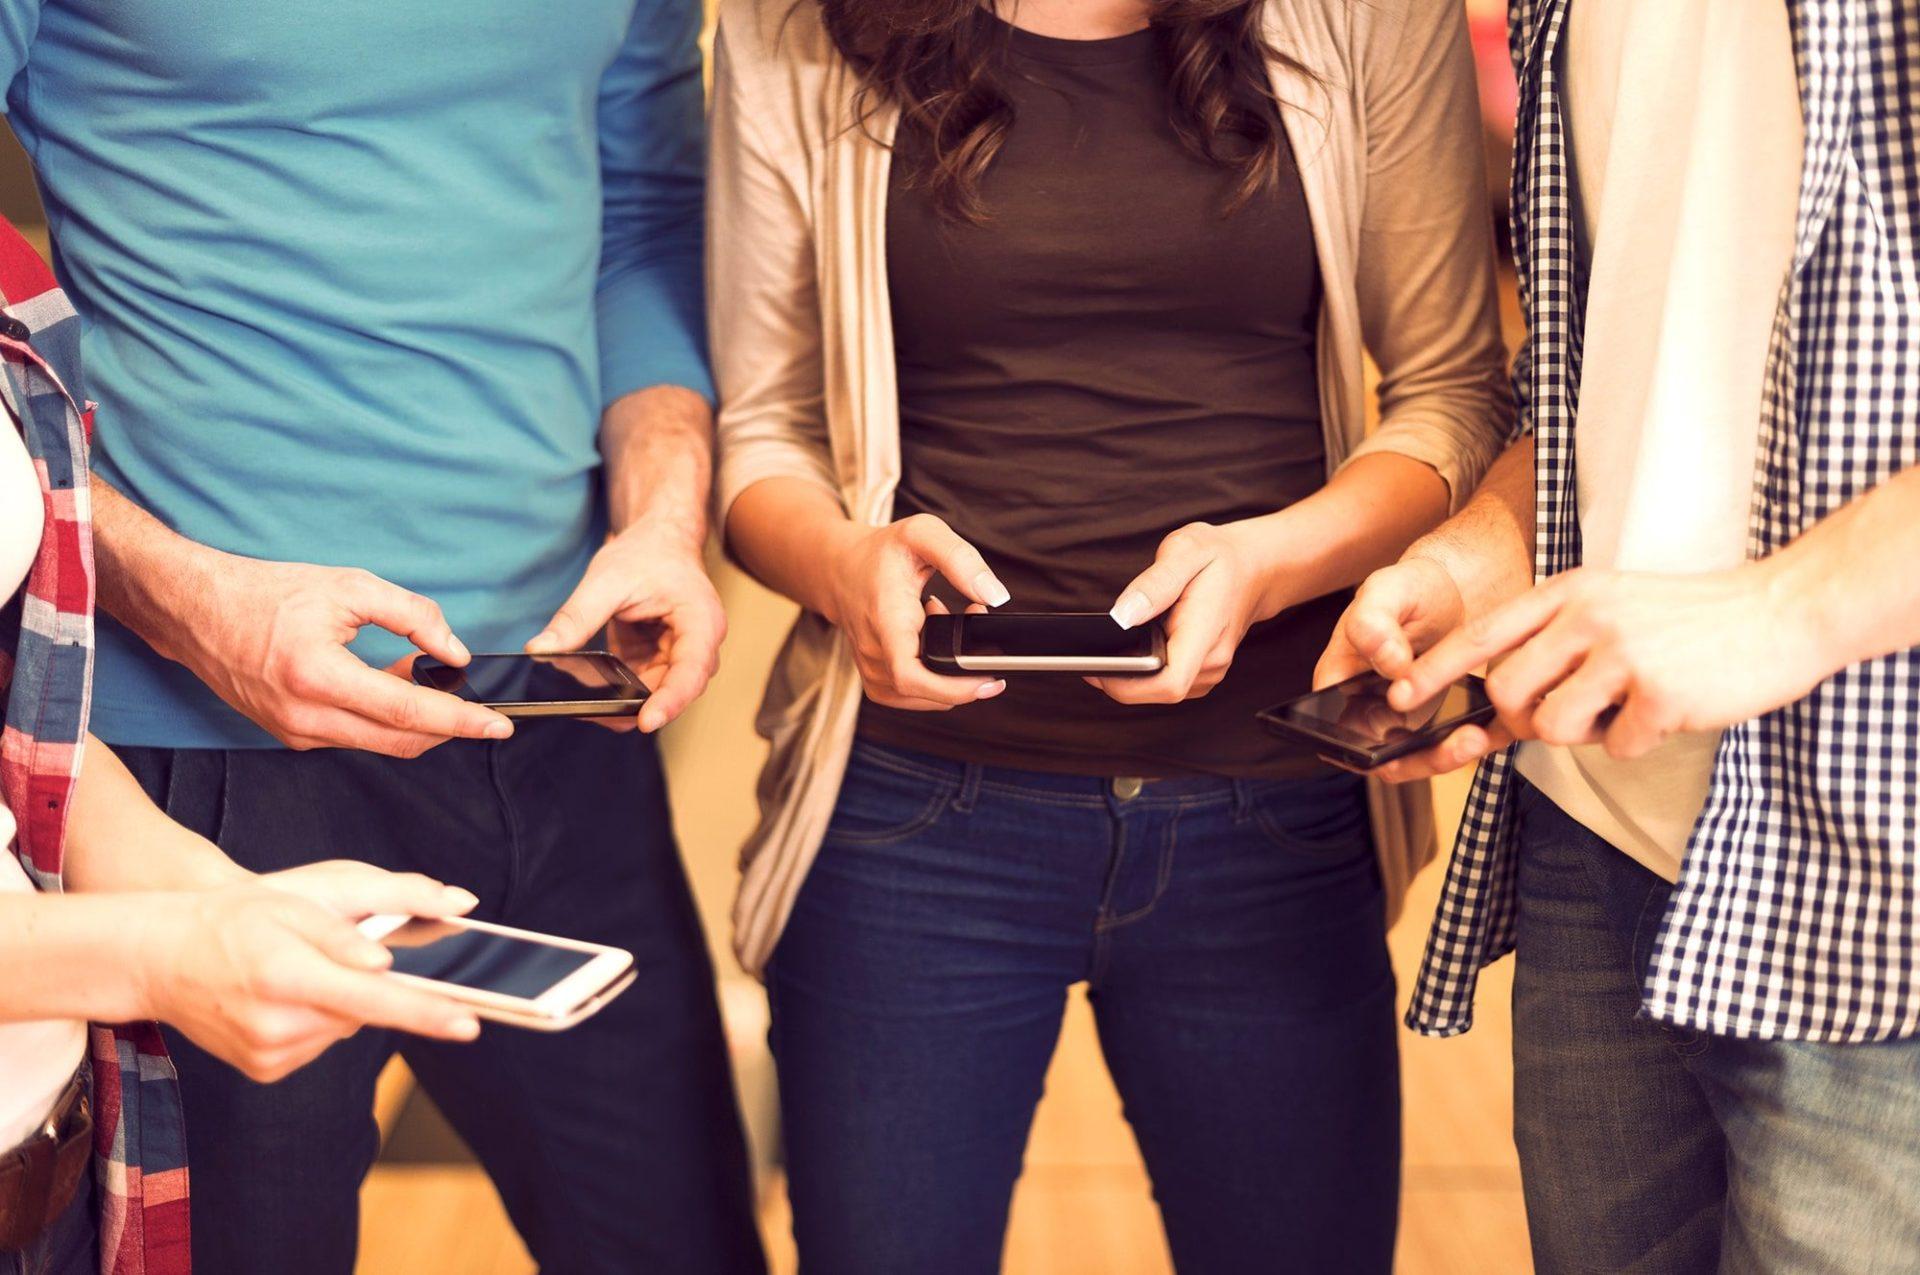 four people looking at social media on phones